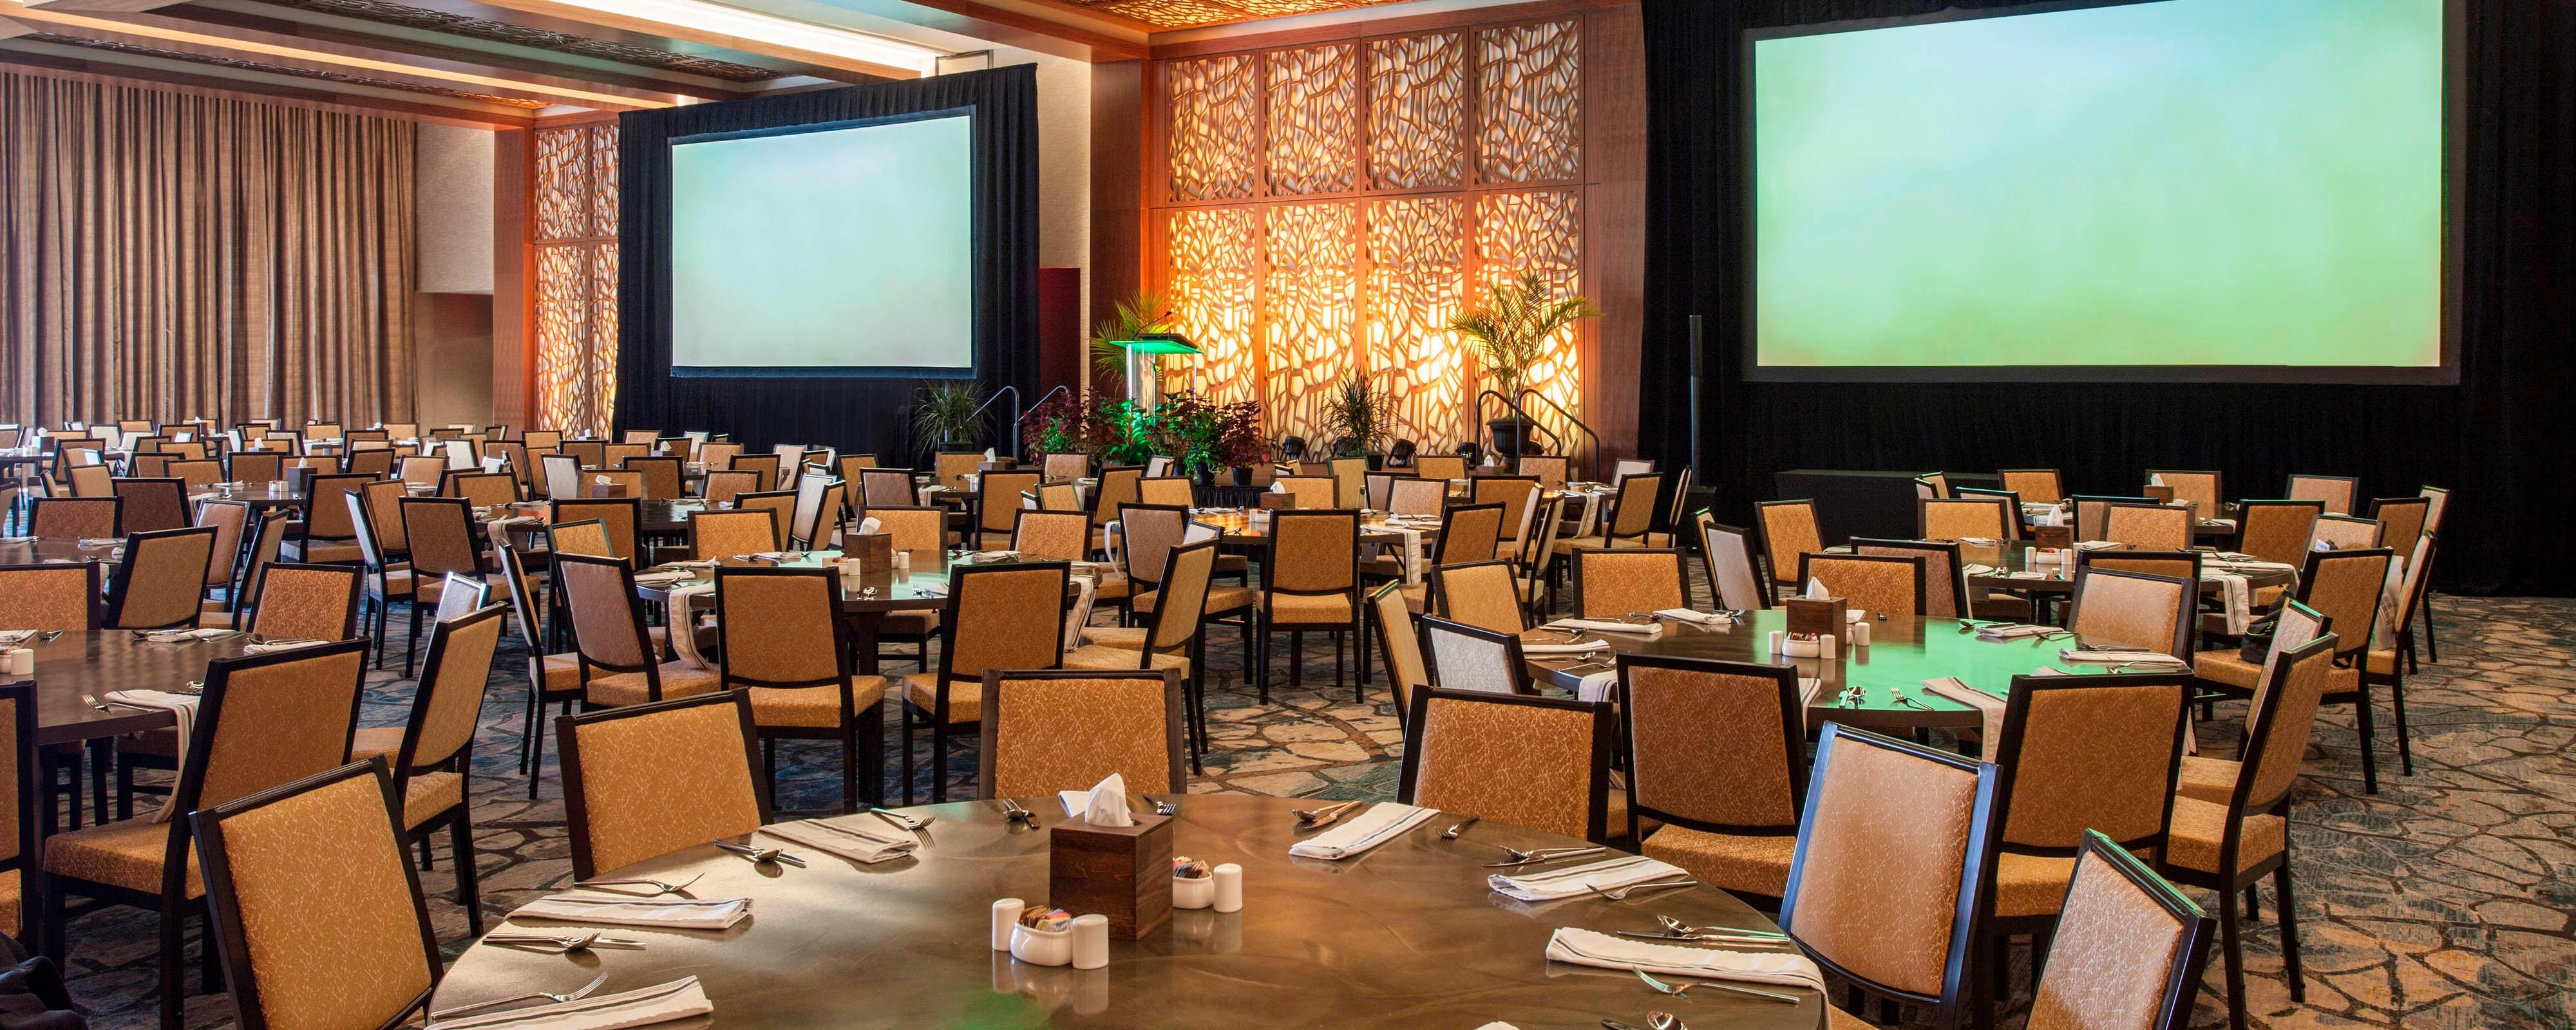 Portman Ballroom - Banquet of 10